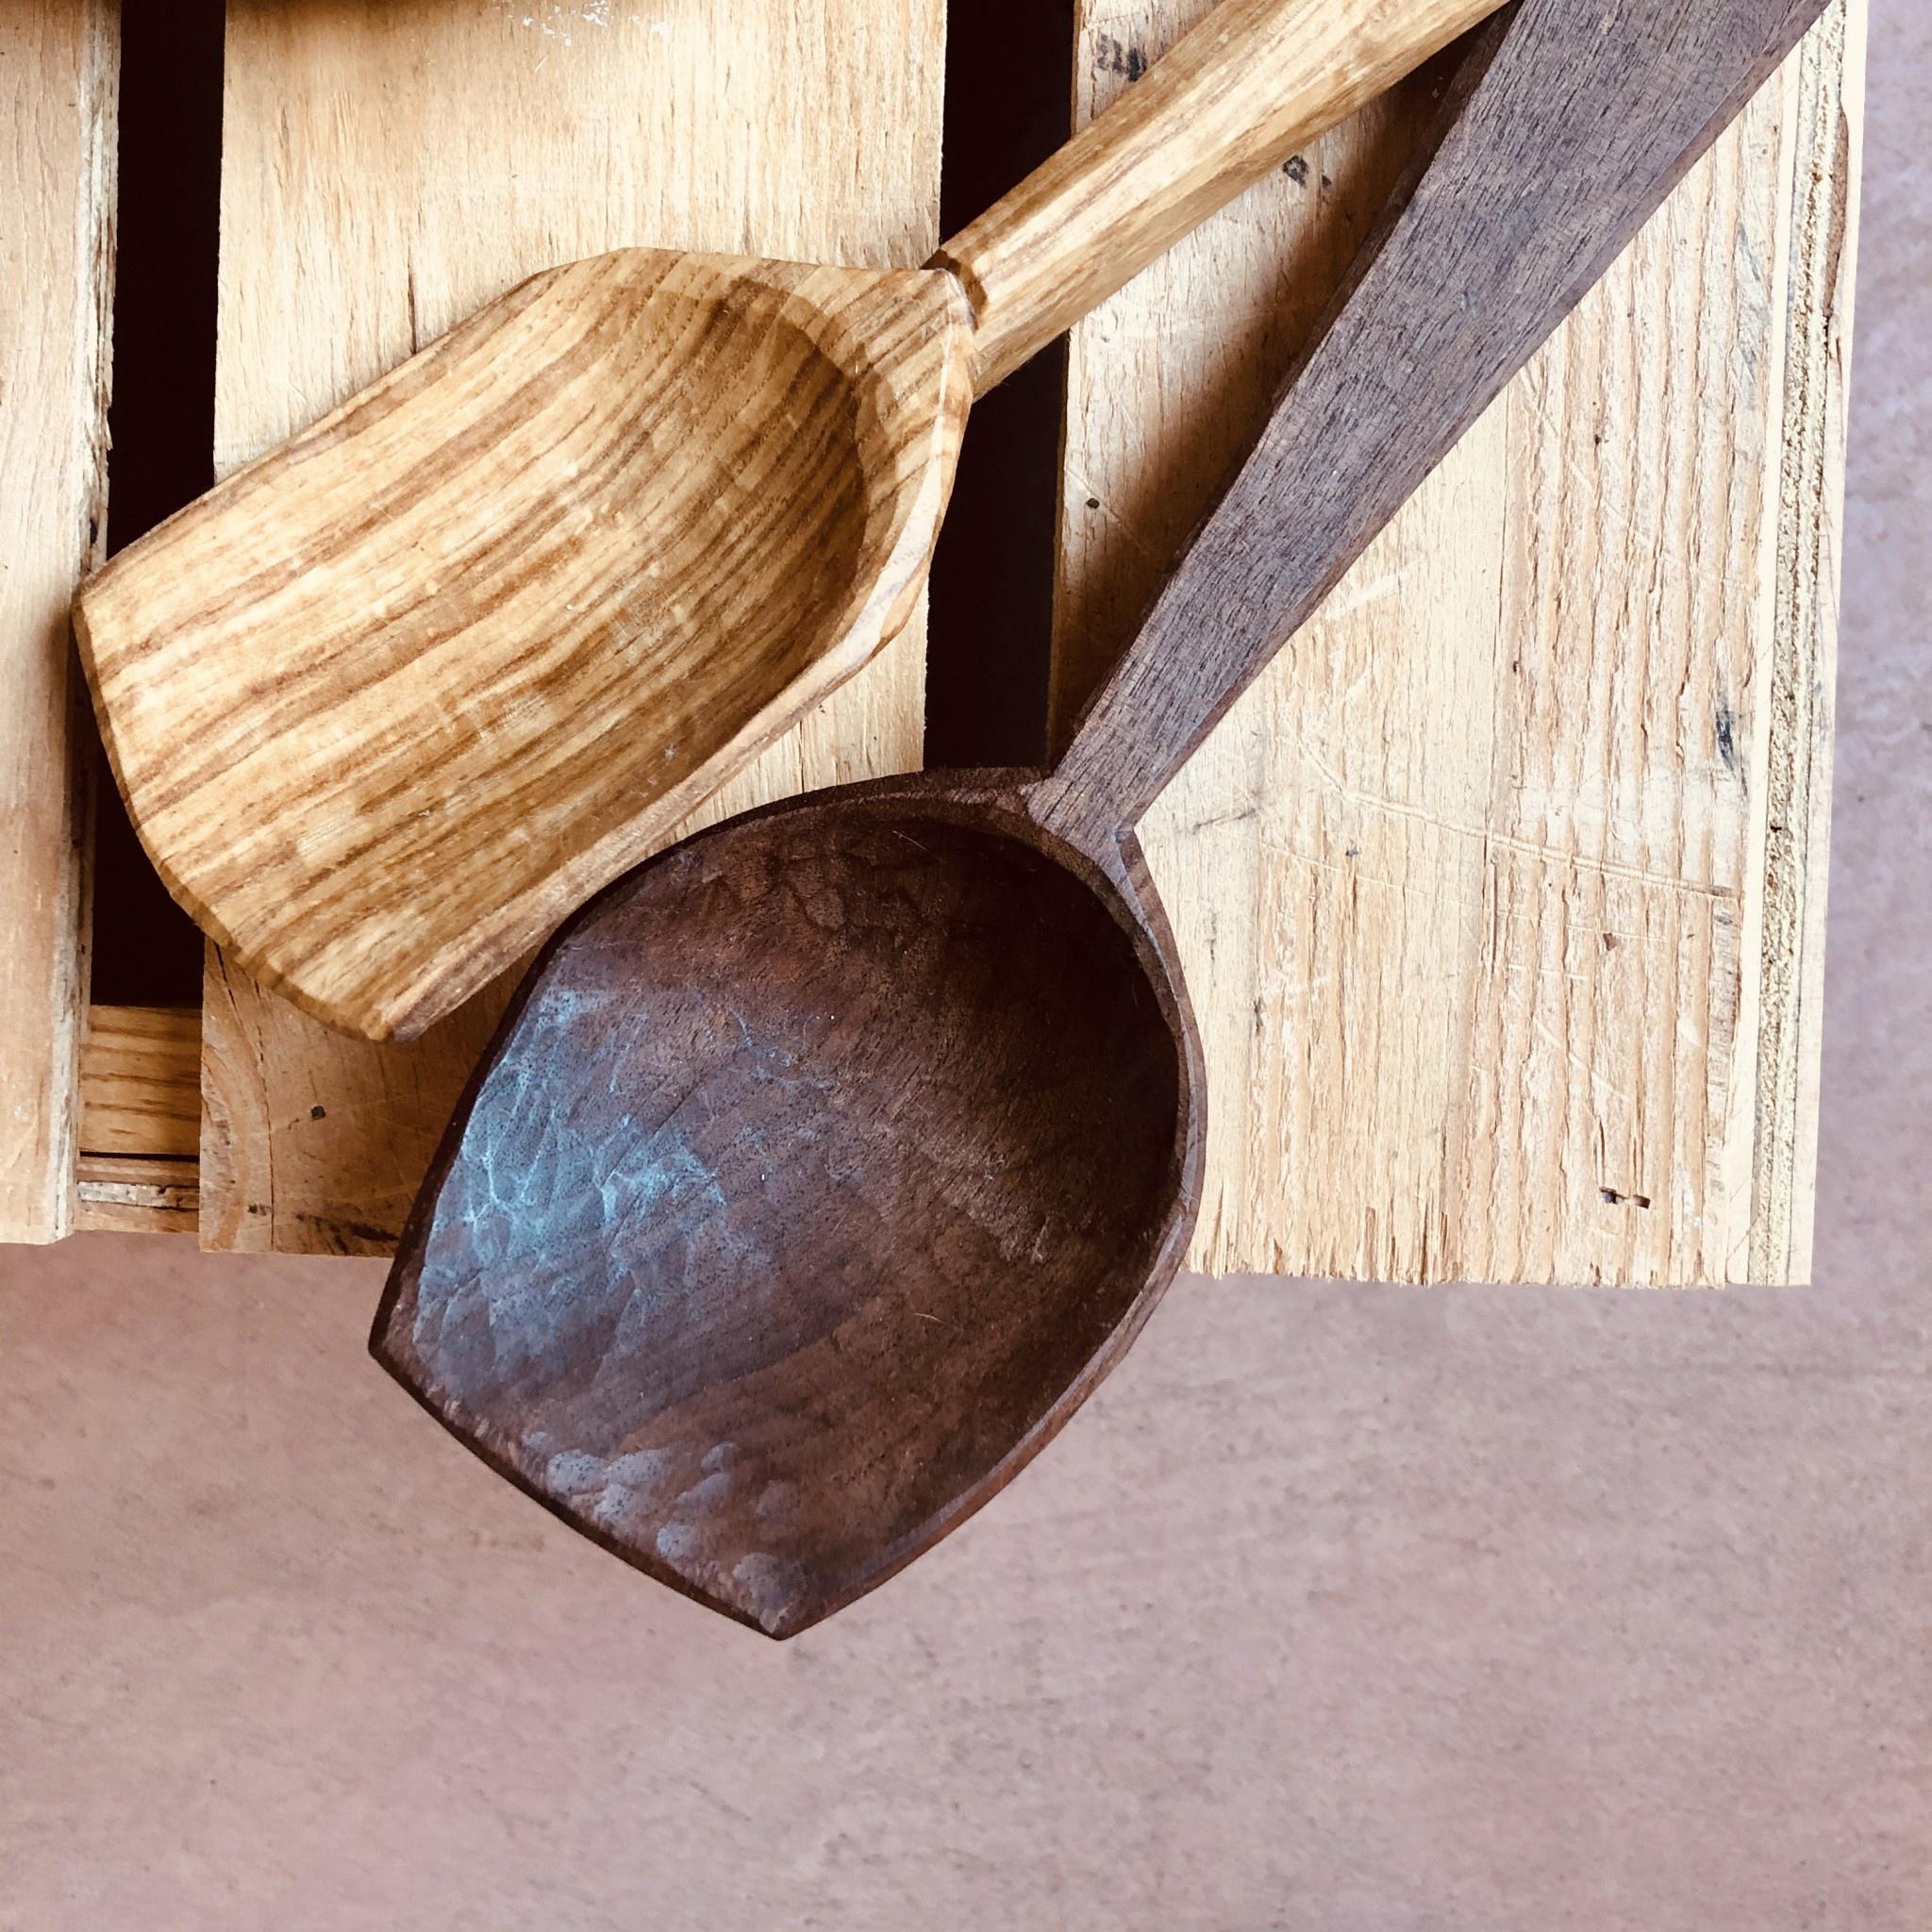 Three Acorns Three Acorn Ash Cooking/Serving Spoon